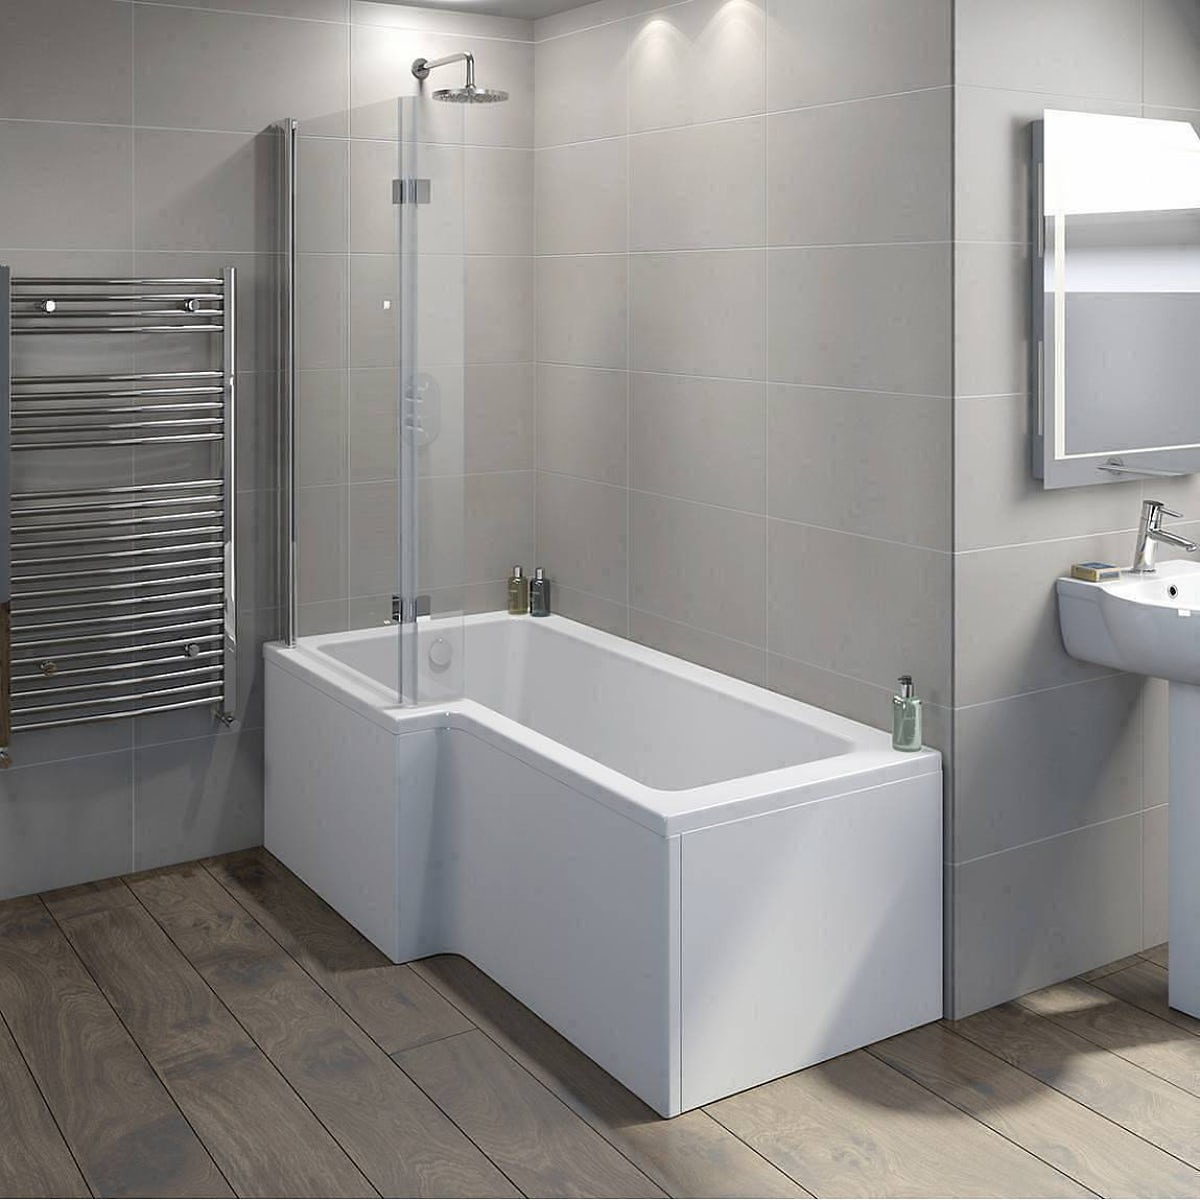 Mode luxury 8mm hinged L shaped shower bath screen | VictoriaPlum.com